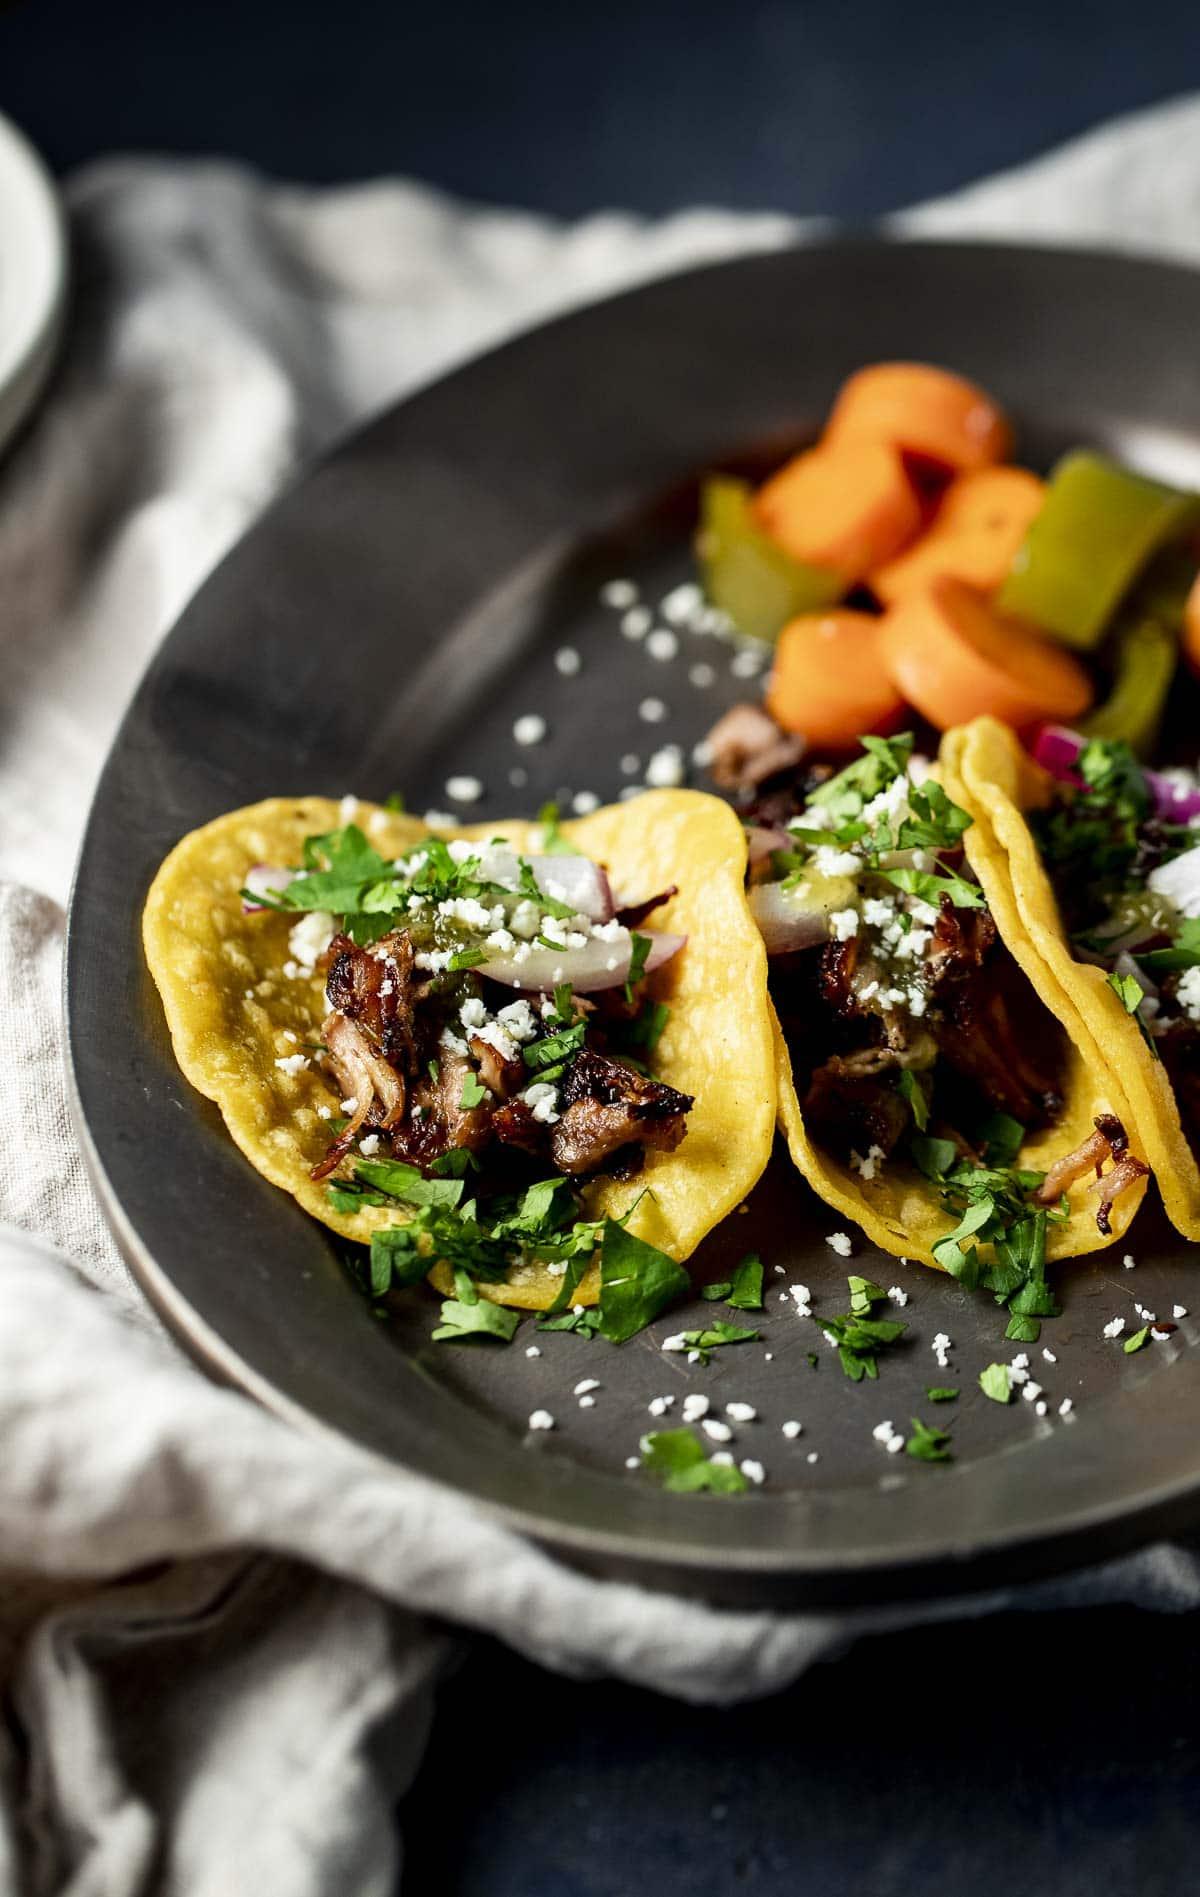 Pork carnitas tacos served on a black plate.